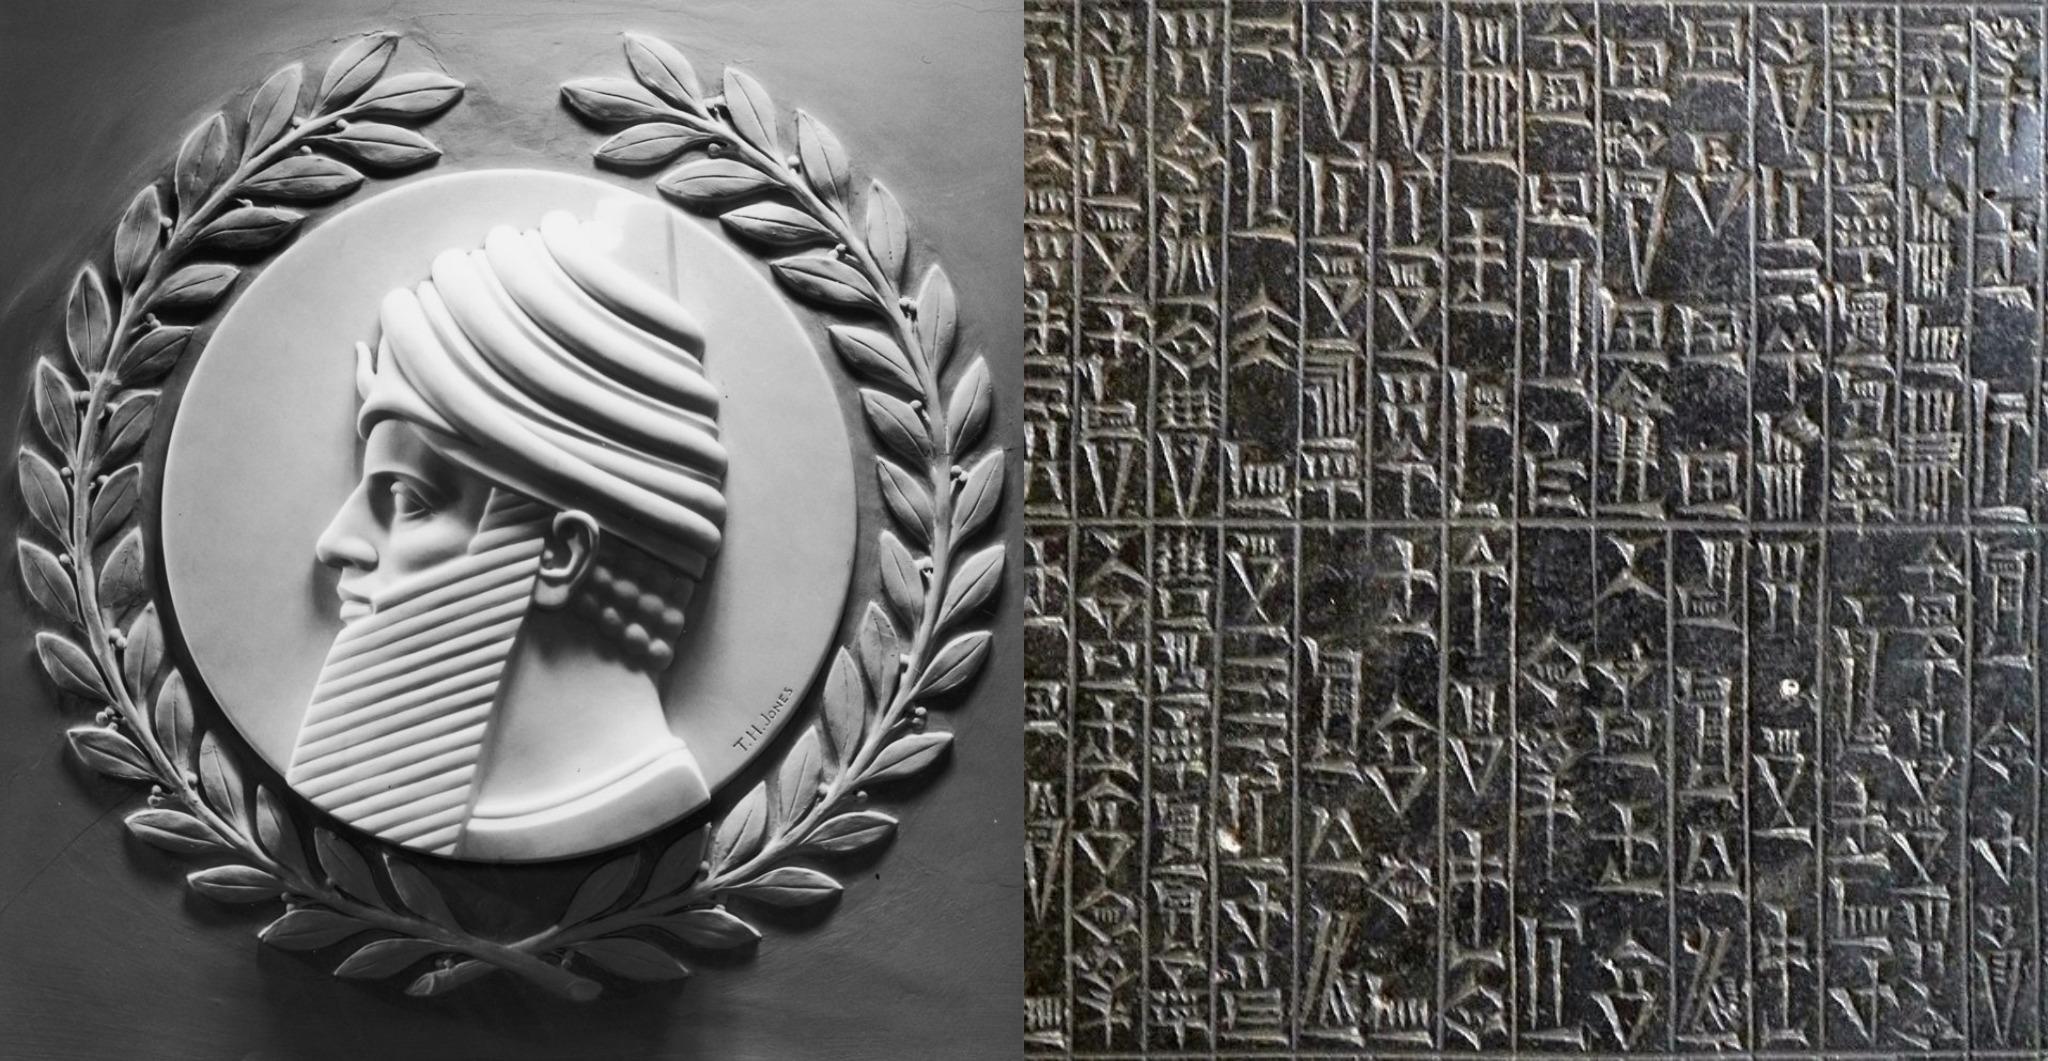 Depiction of Hammurabi and the actual Code itself.